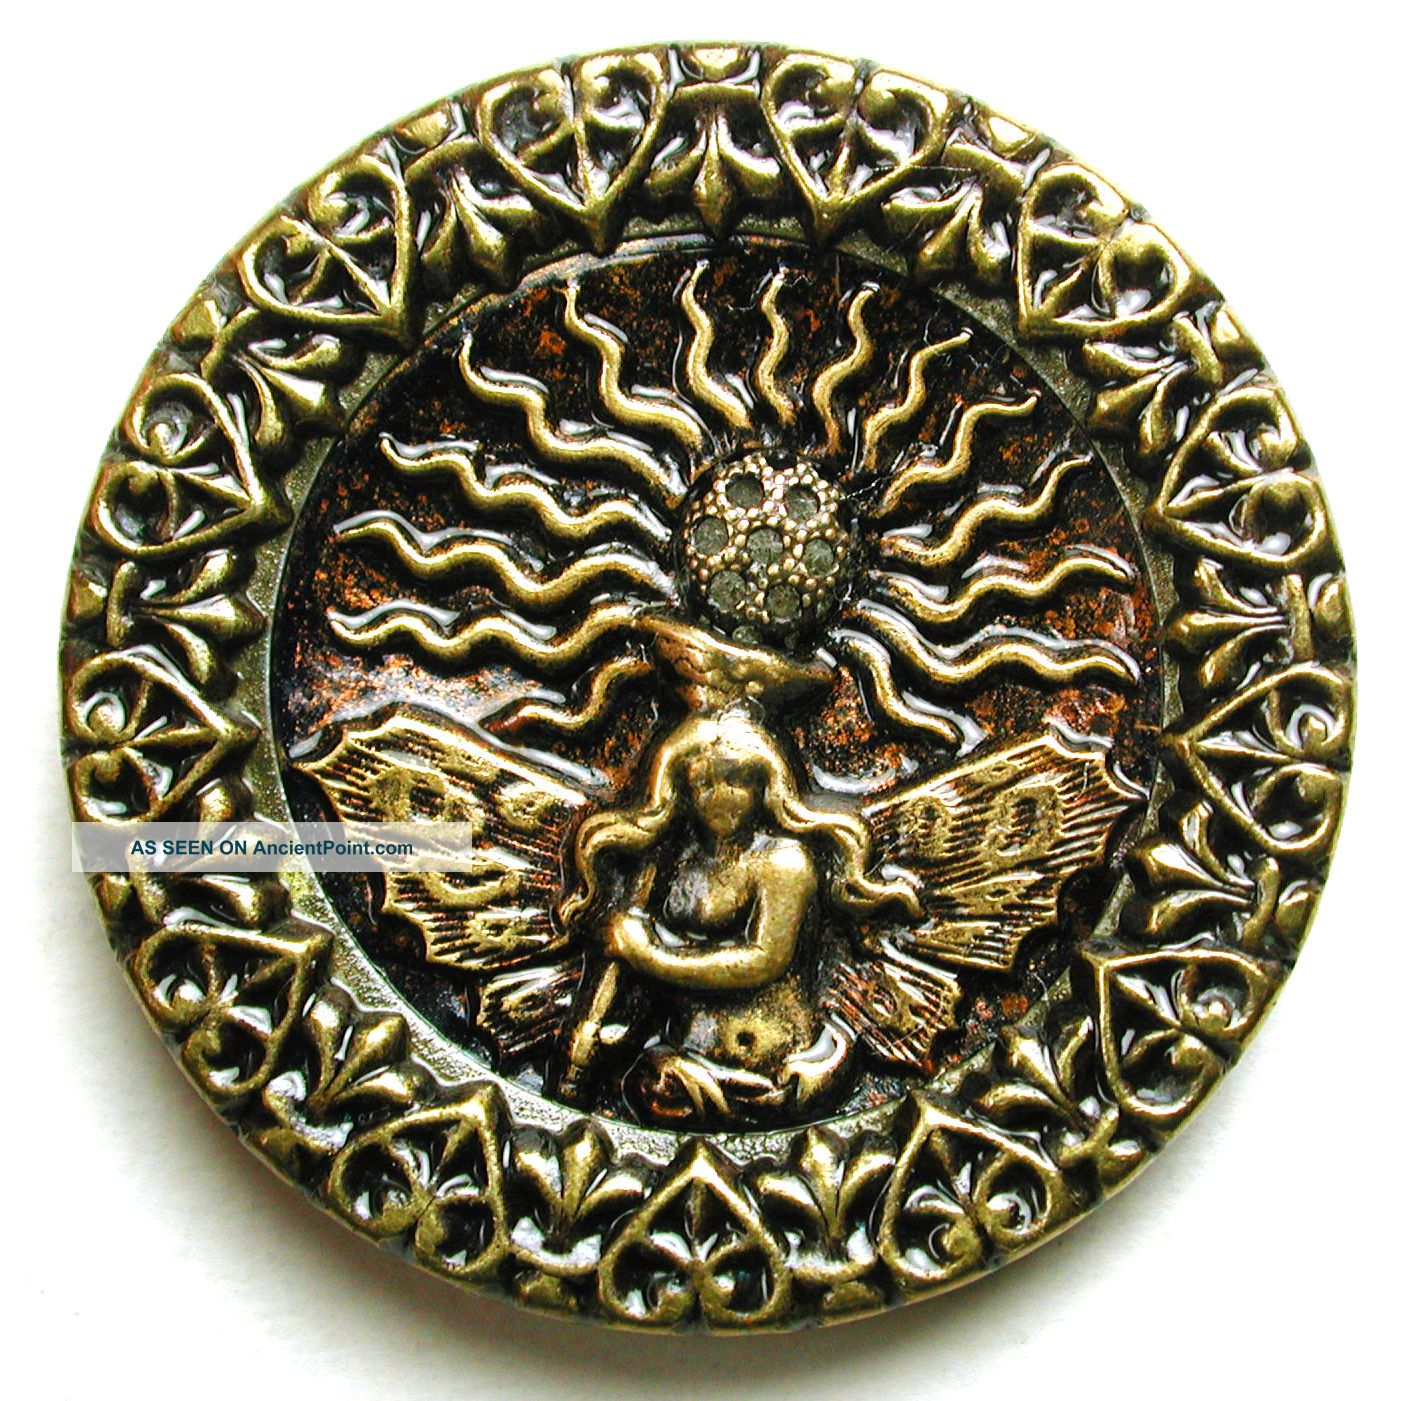 Lg Sz Antique Brass Button Detailed Fire Fairy Pictorial Image 1 & 7/16